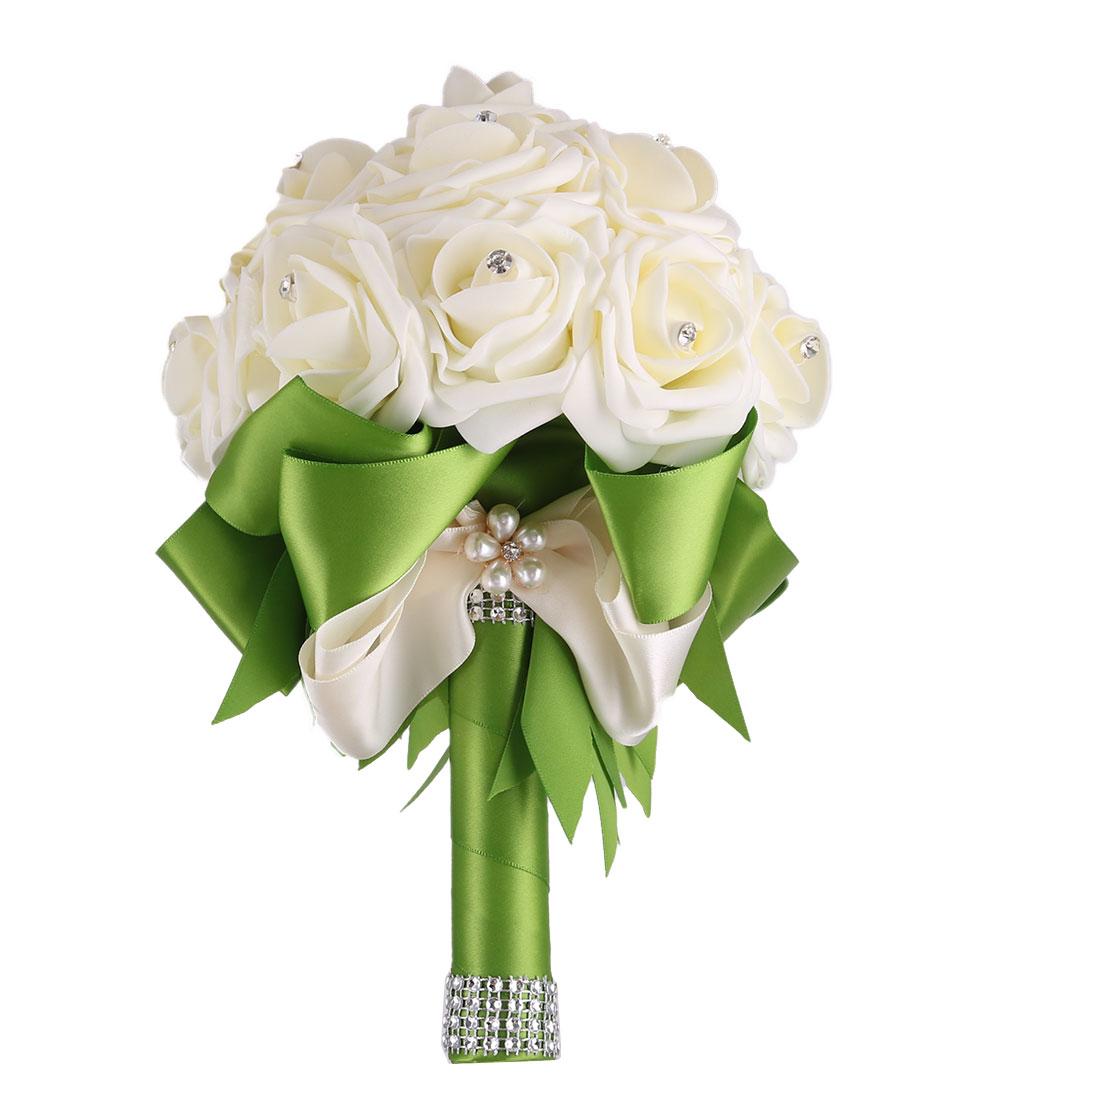 Wedding Globular Ribbon Decor Bridal Artificial Flower Handhold Bouquet Green